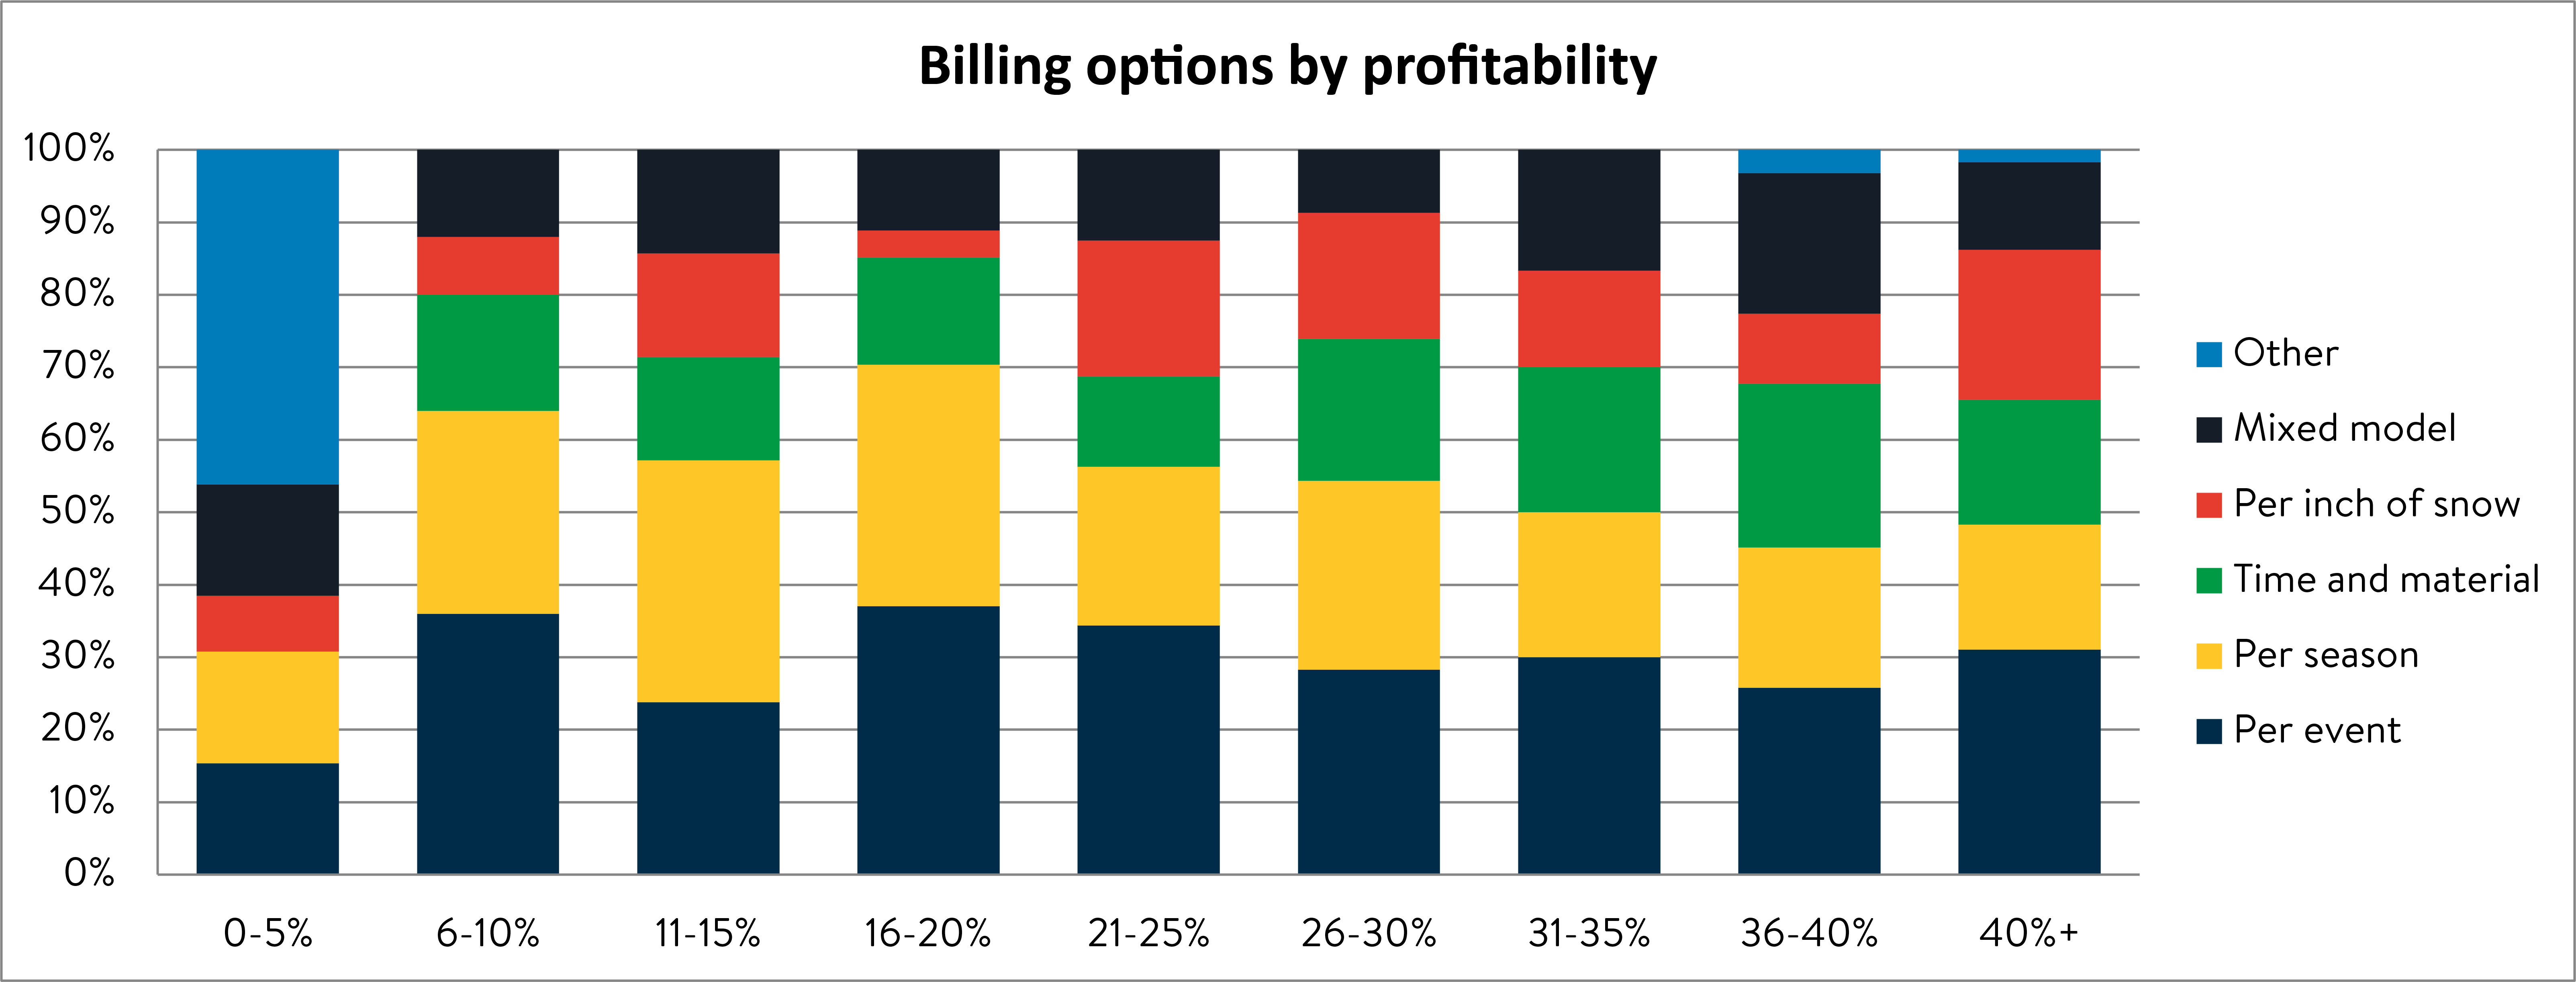 Billing options by profitability